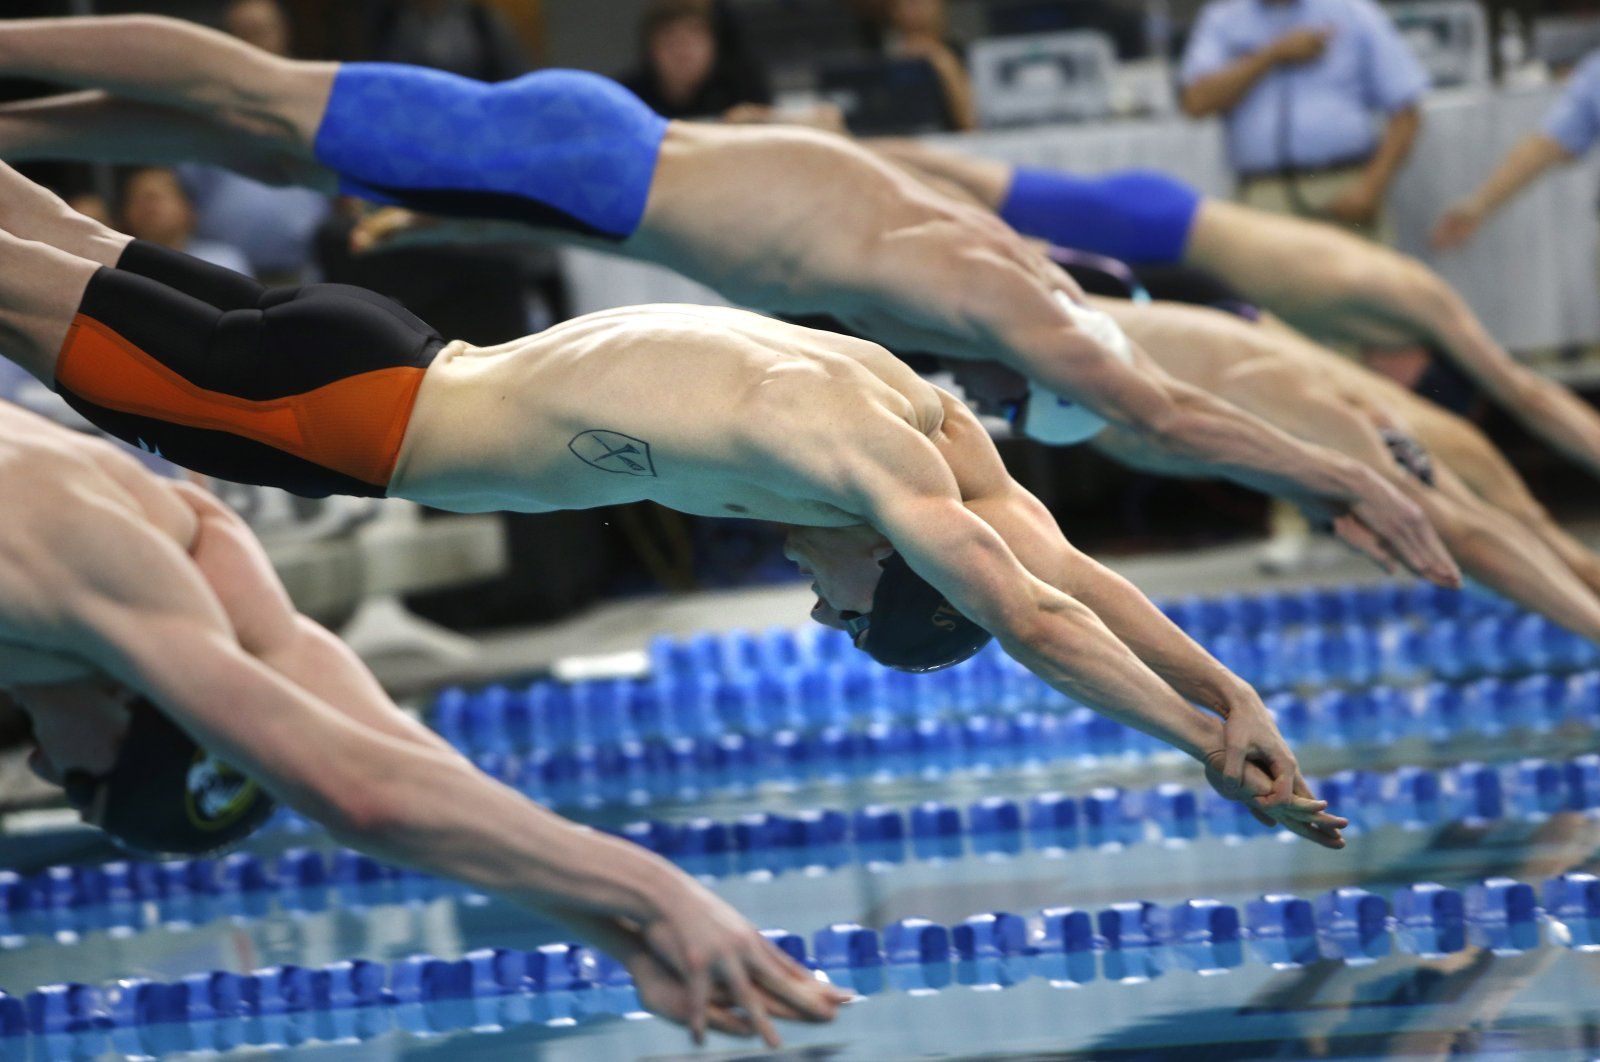 Andrew Wilson (C) competes in the men's 100-meter breaststroke in Austin, Texas, U.S., Jan. 17, 2016. (AP Photo)